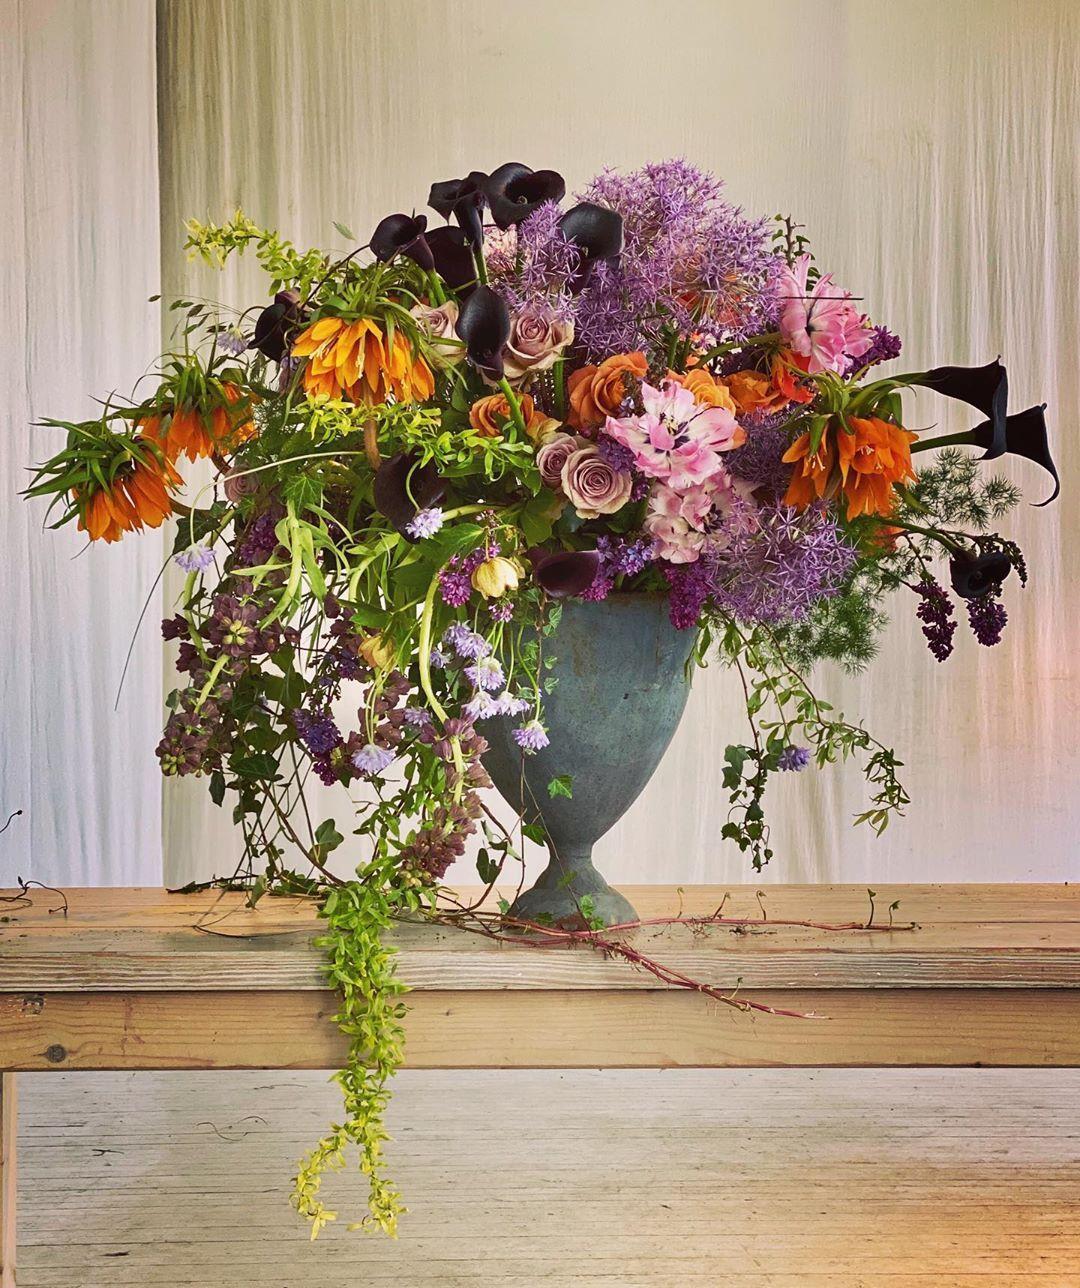 Gregor Lersch On Instagram Springflowers In Spring Days In Not To Much Of A Spring Mood An Arrangement In A Gardening Feeling Flowerd Bloemen